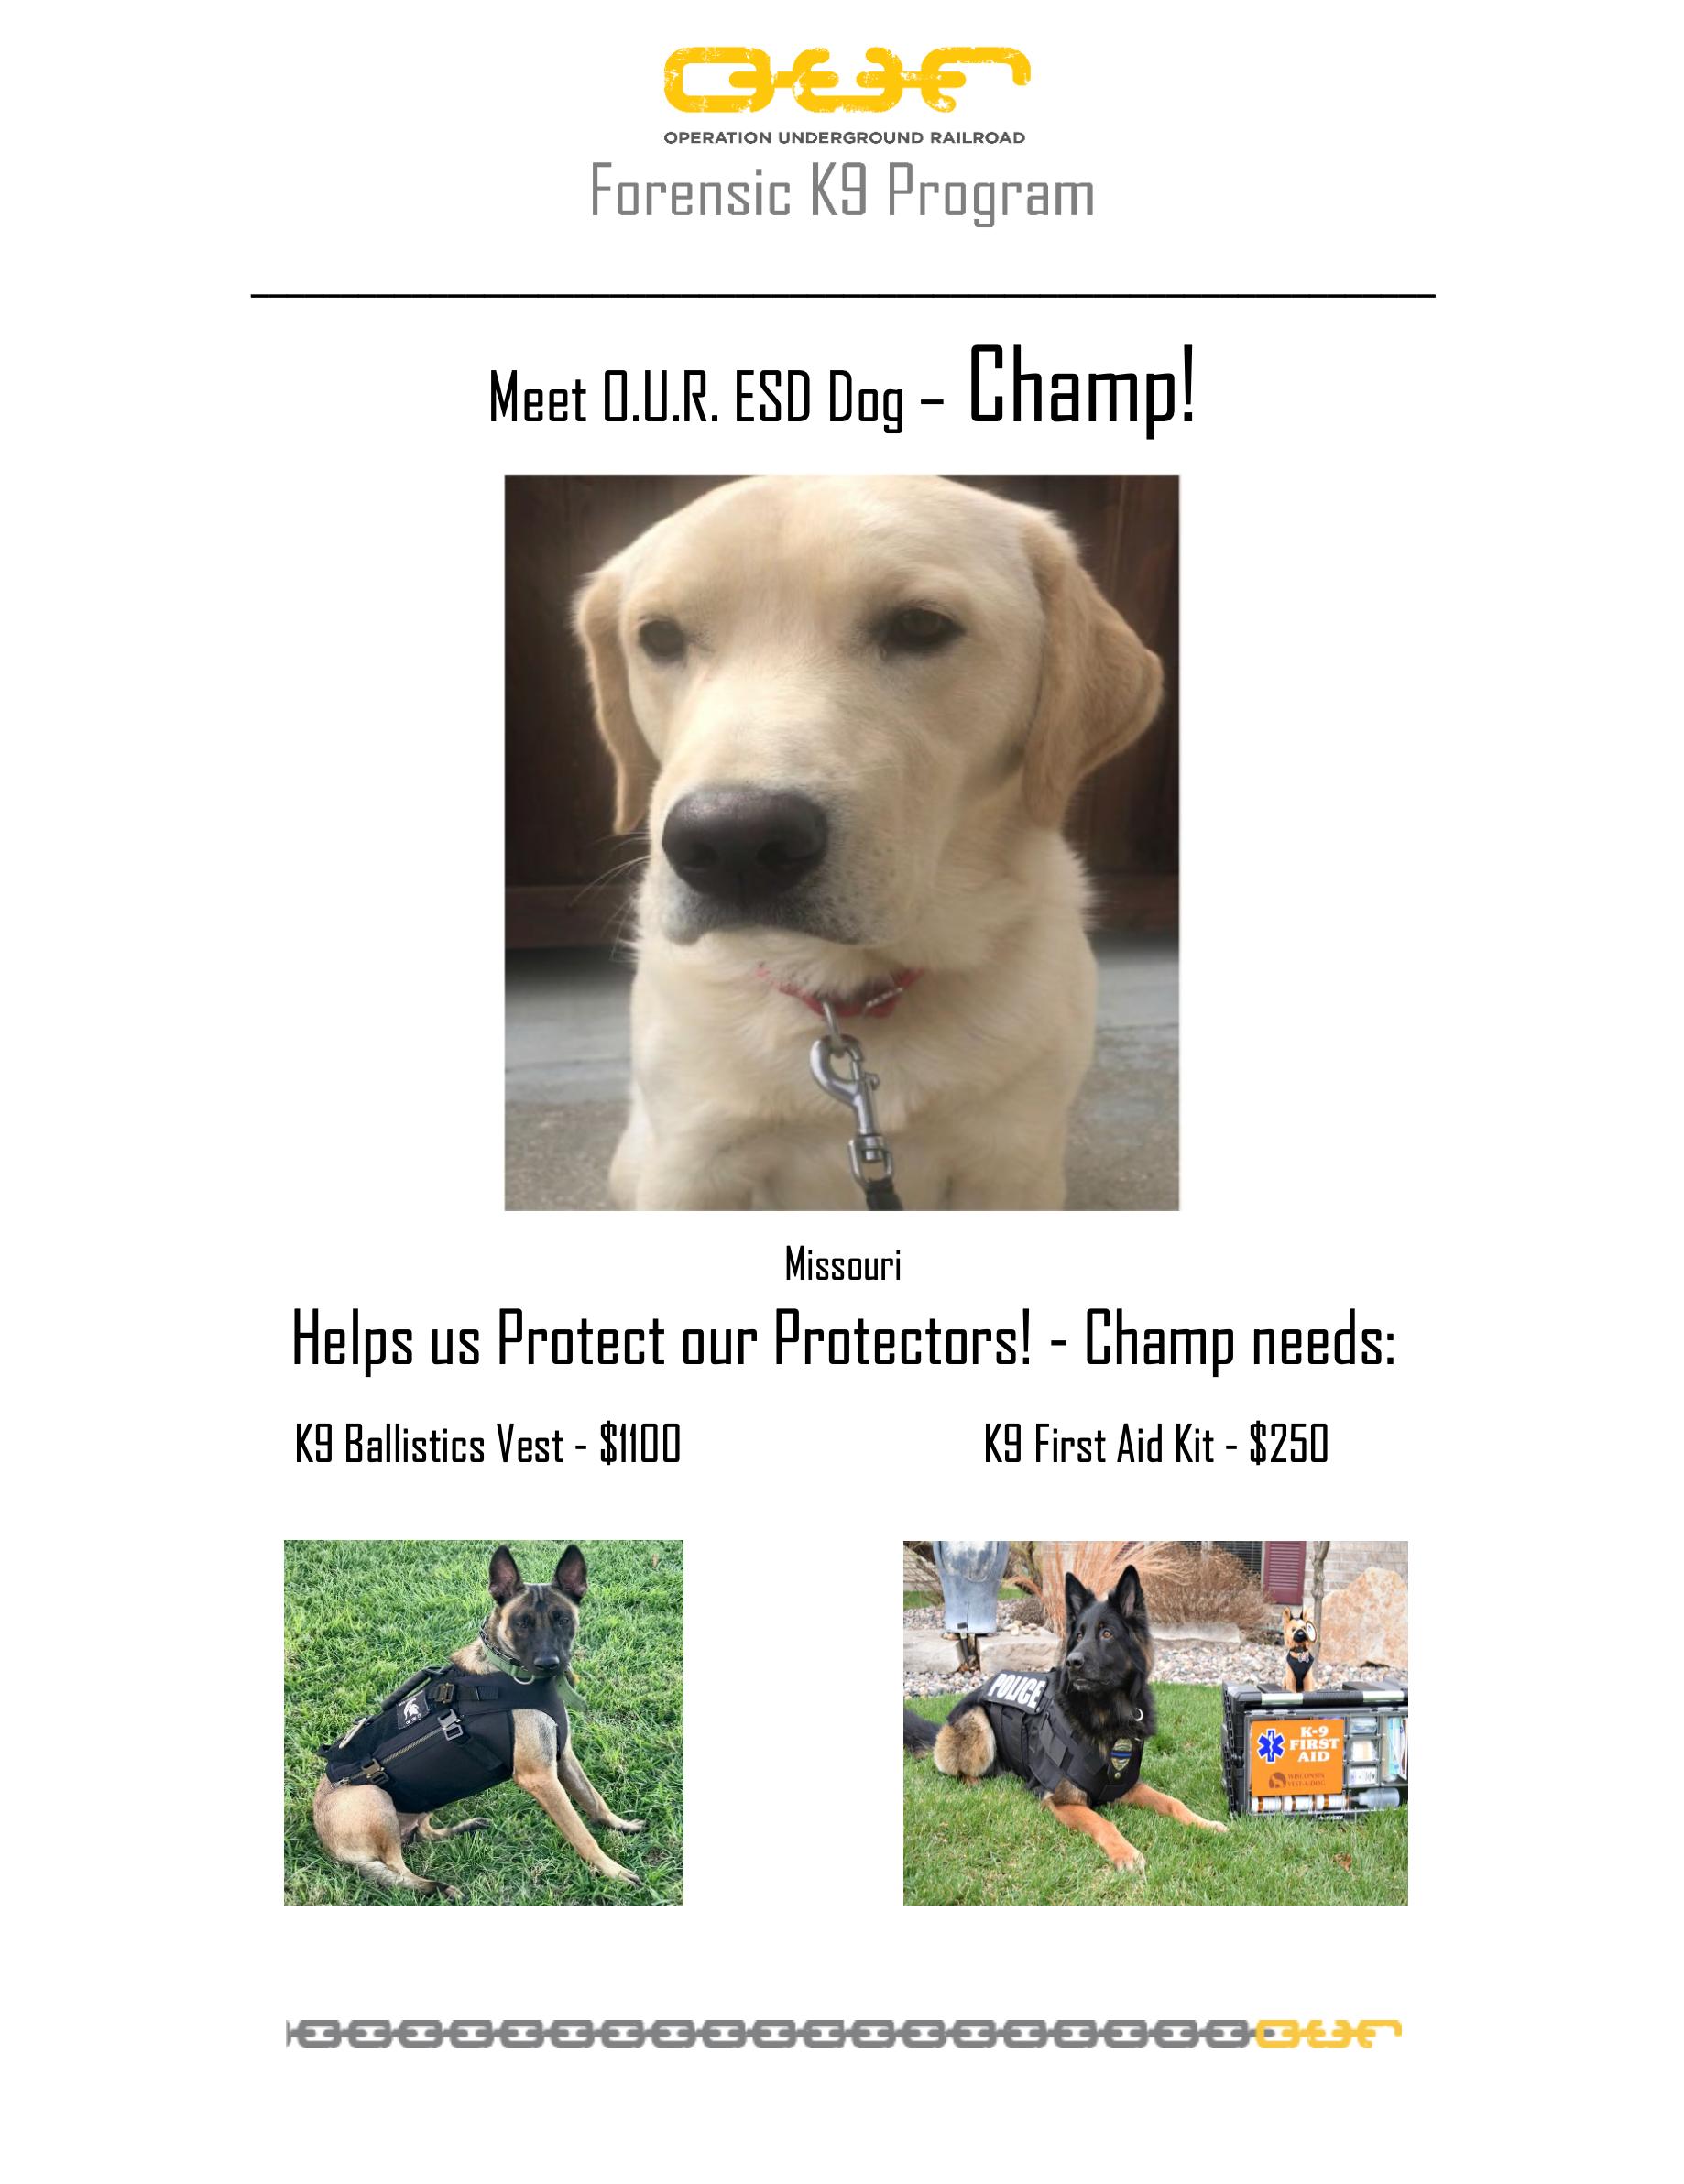 Protect Champ - Jefferson City, Missouri